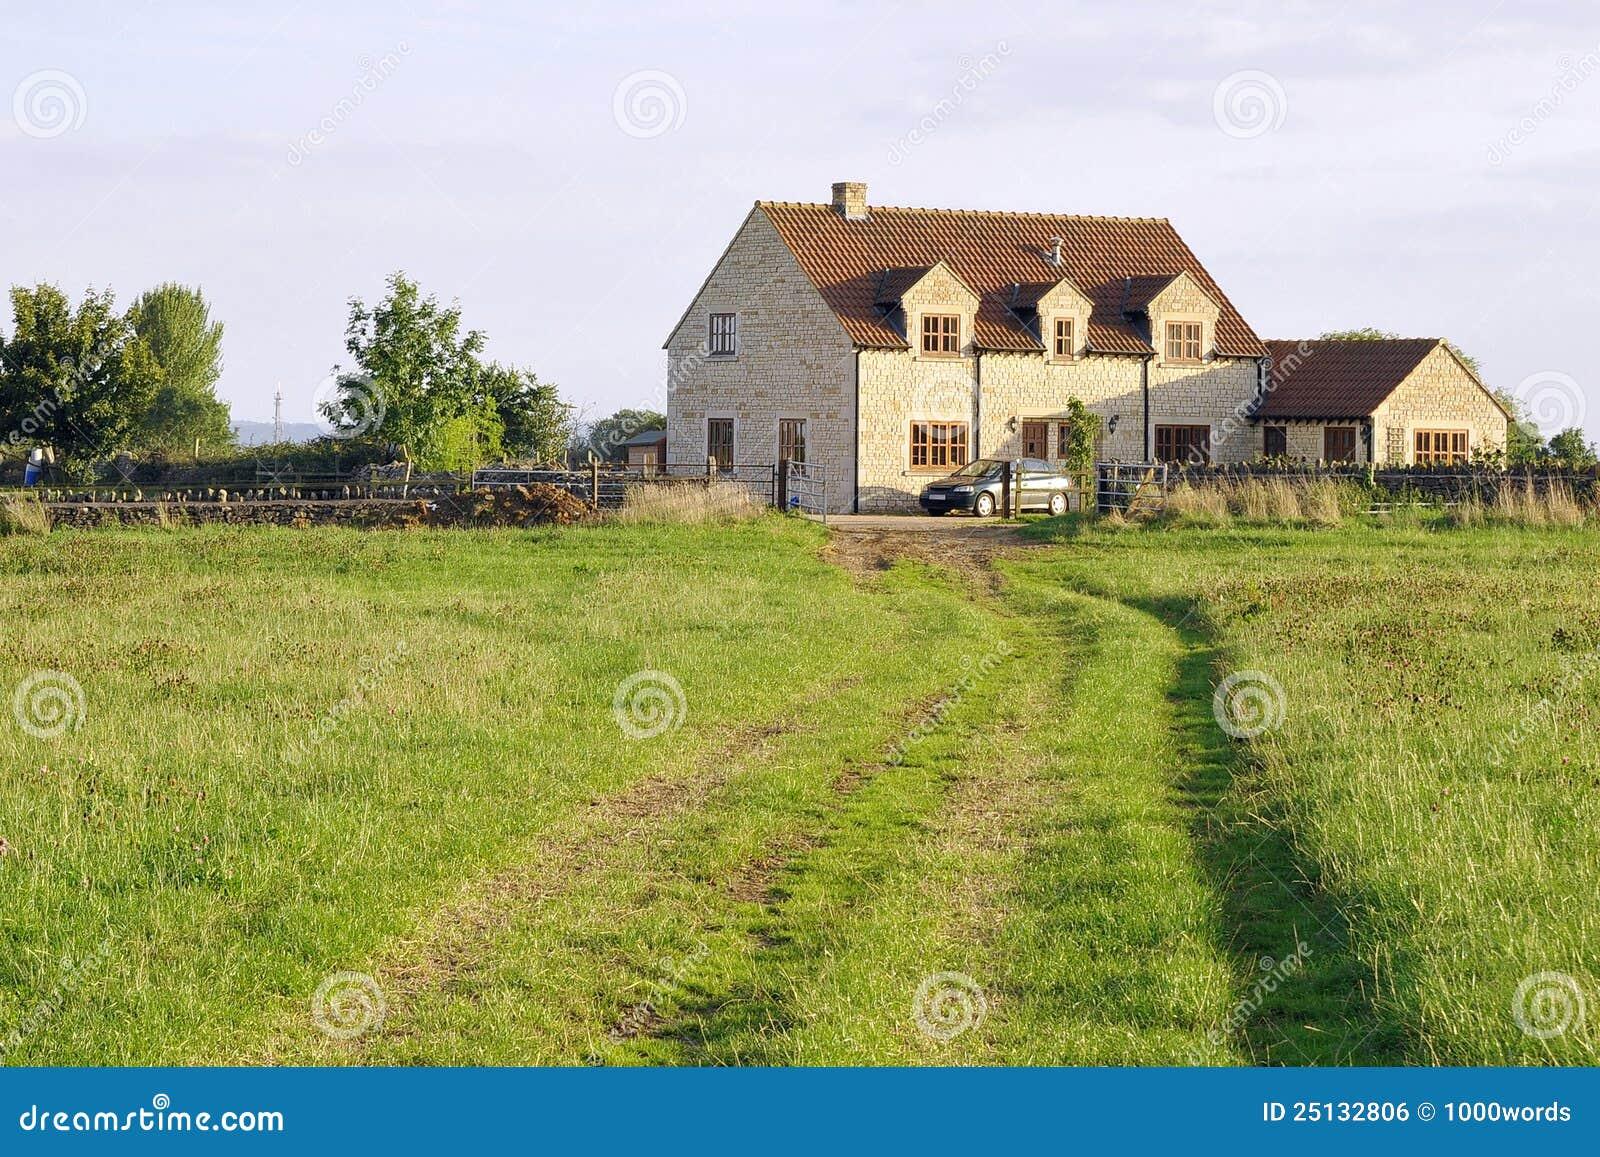 English Farmhouse And Grounds Royalty Free Stock Image Image